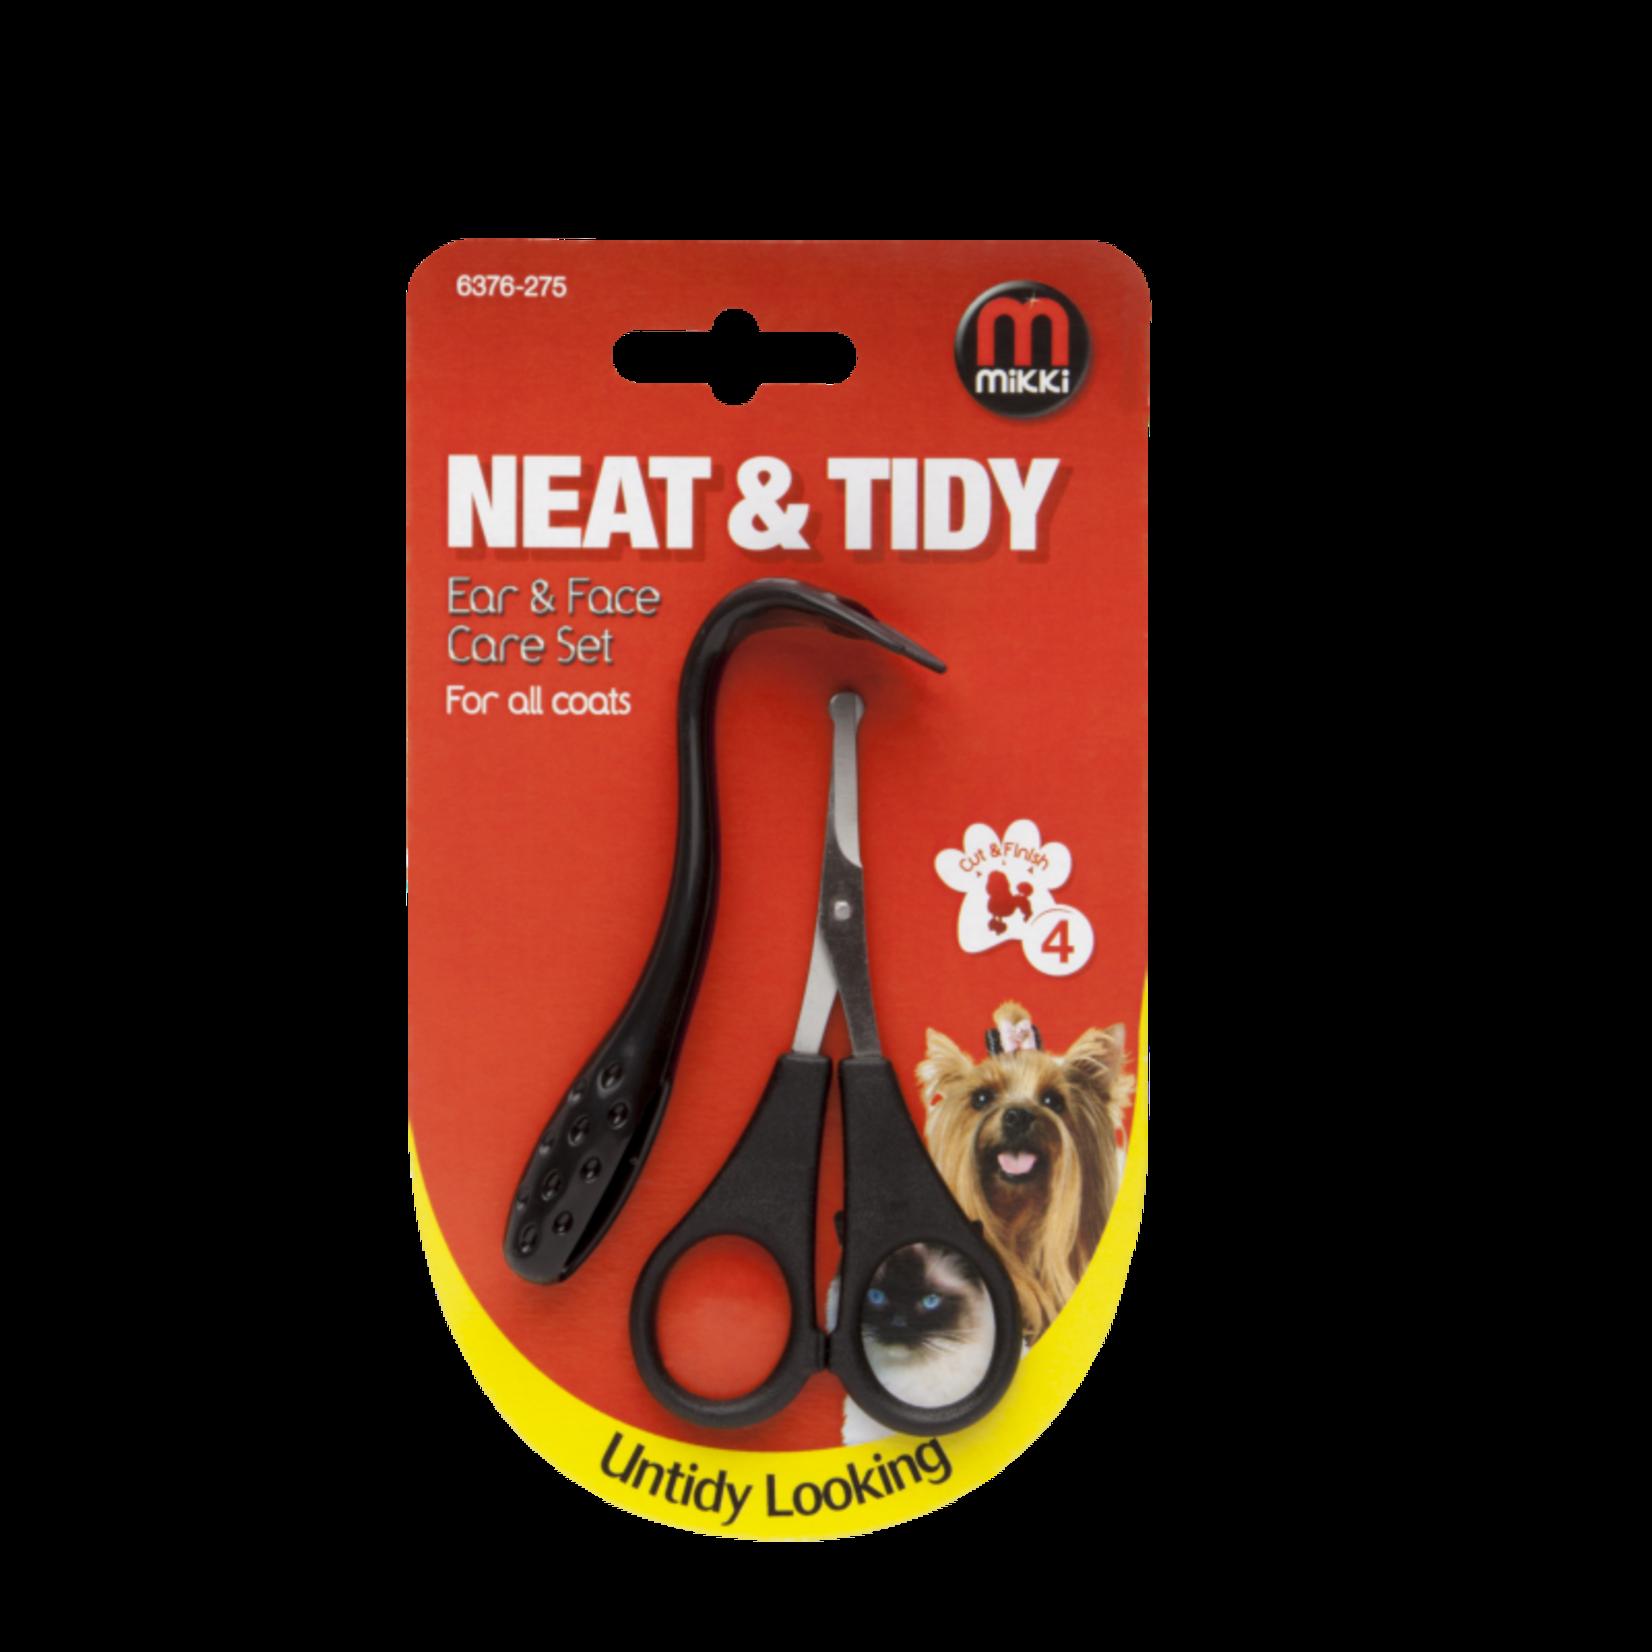 Mikki Neat & Tidy Ear & Face Care Set